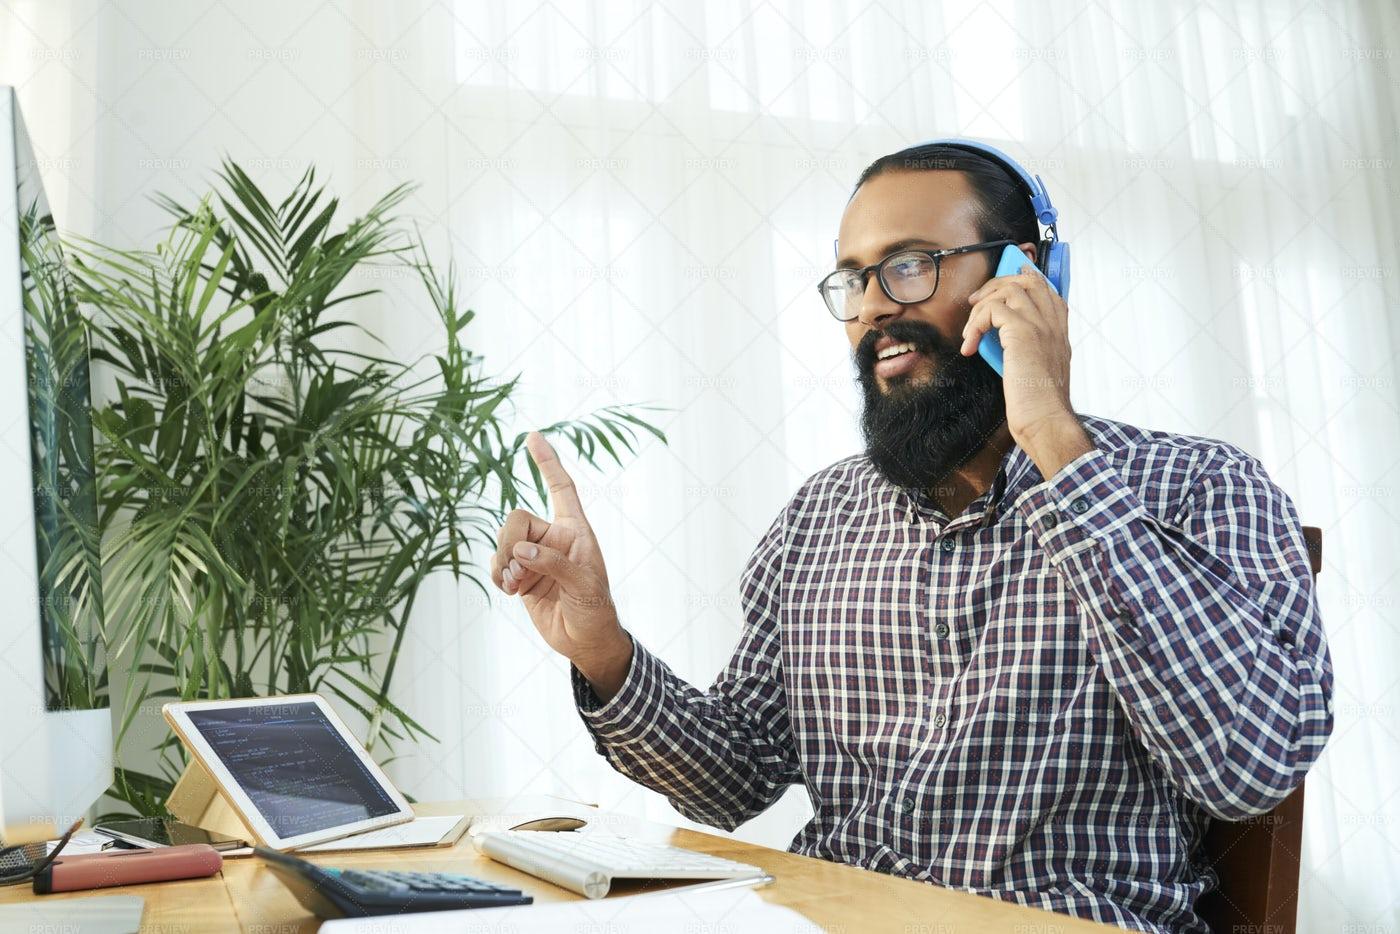 Businessman Has A Phone Call At Office: Stock Photos